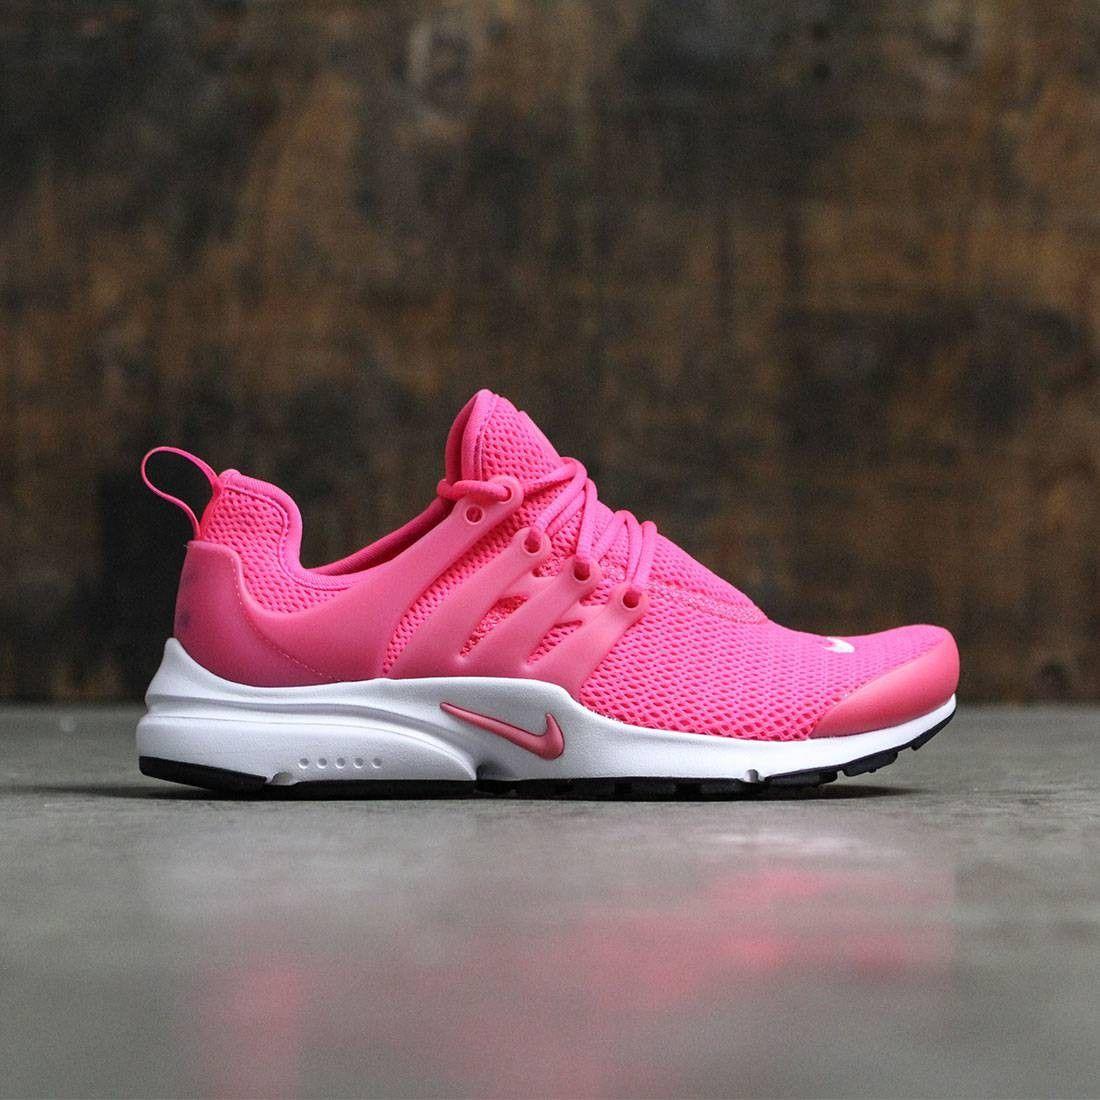 Nike Women Women'S Nike Air Presto (hyper pink / white-black)